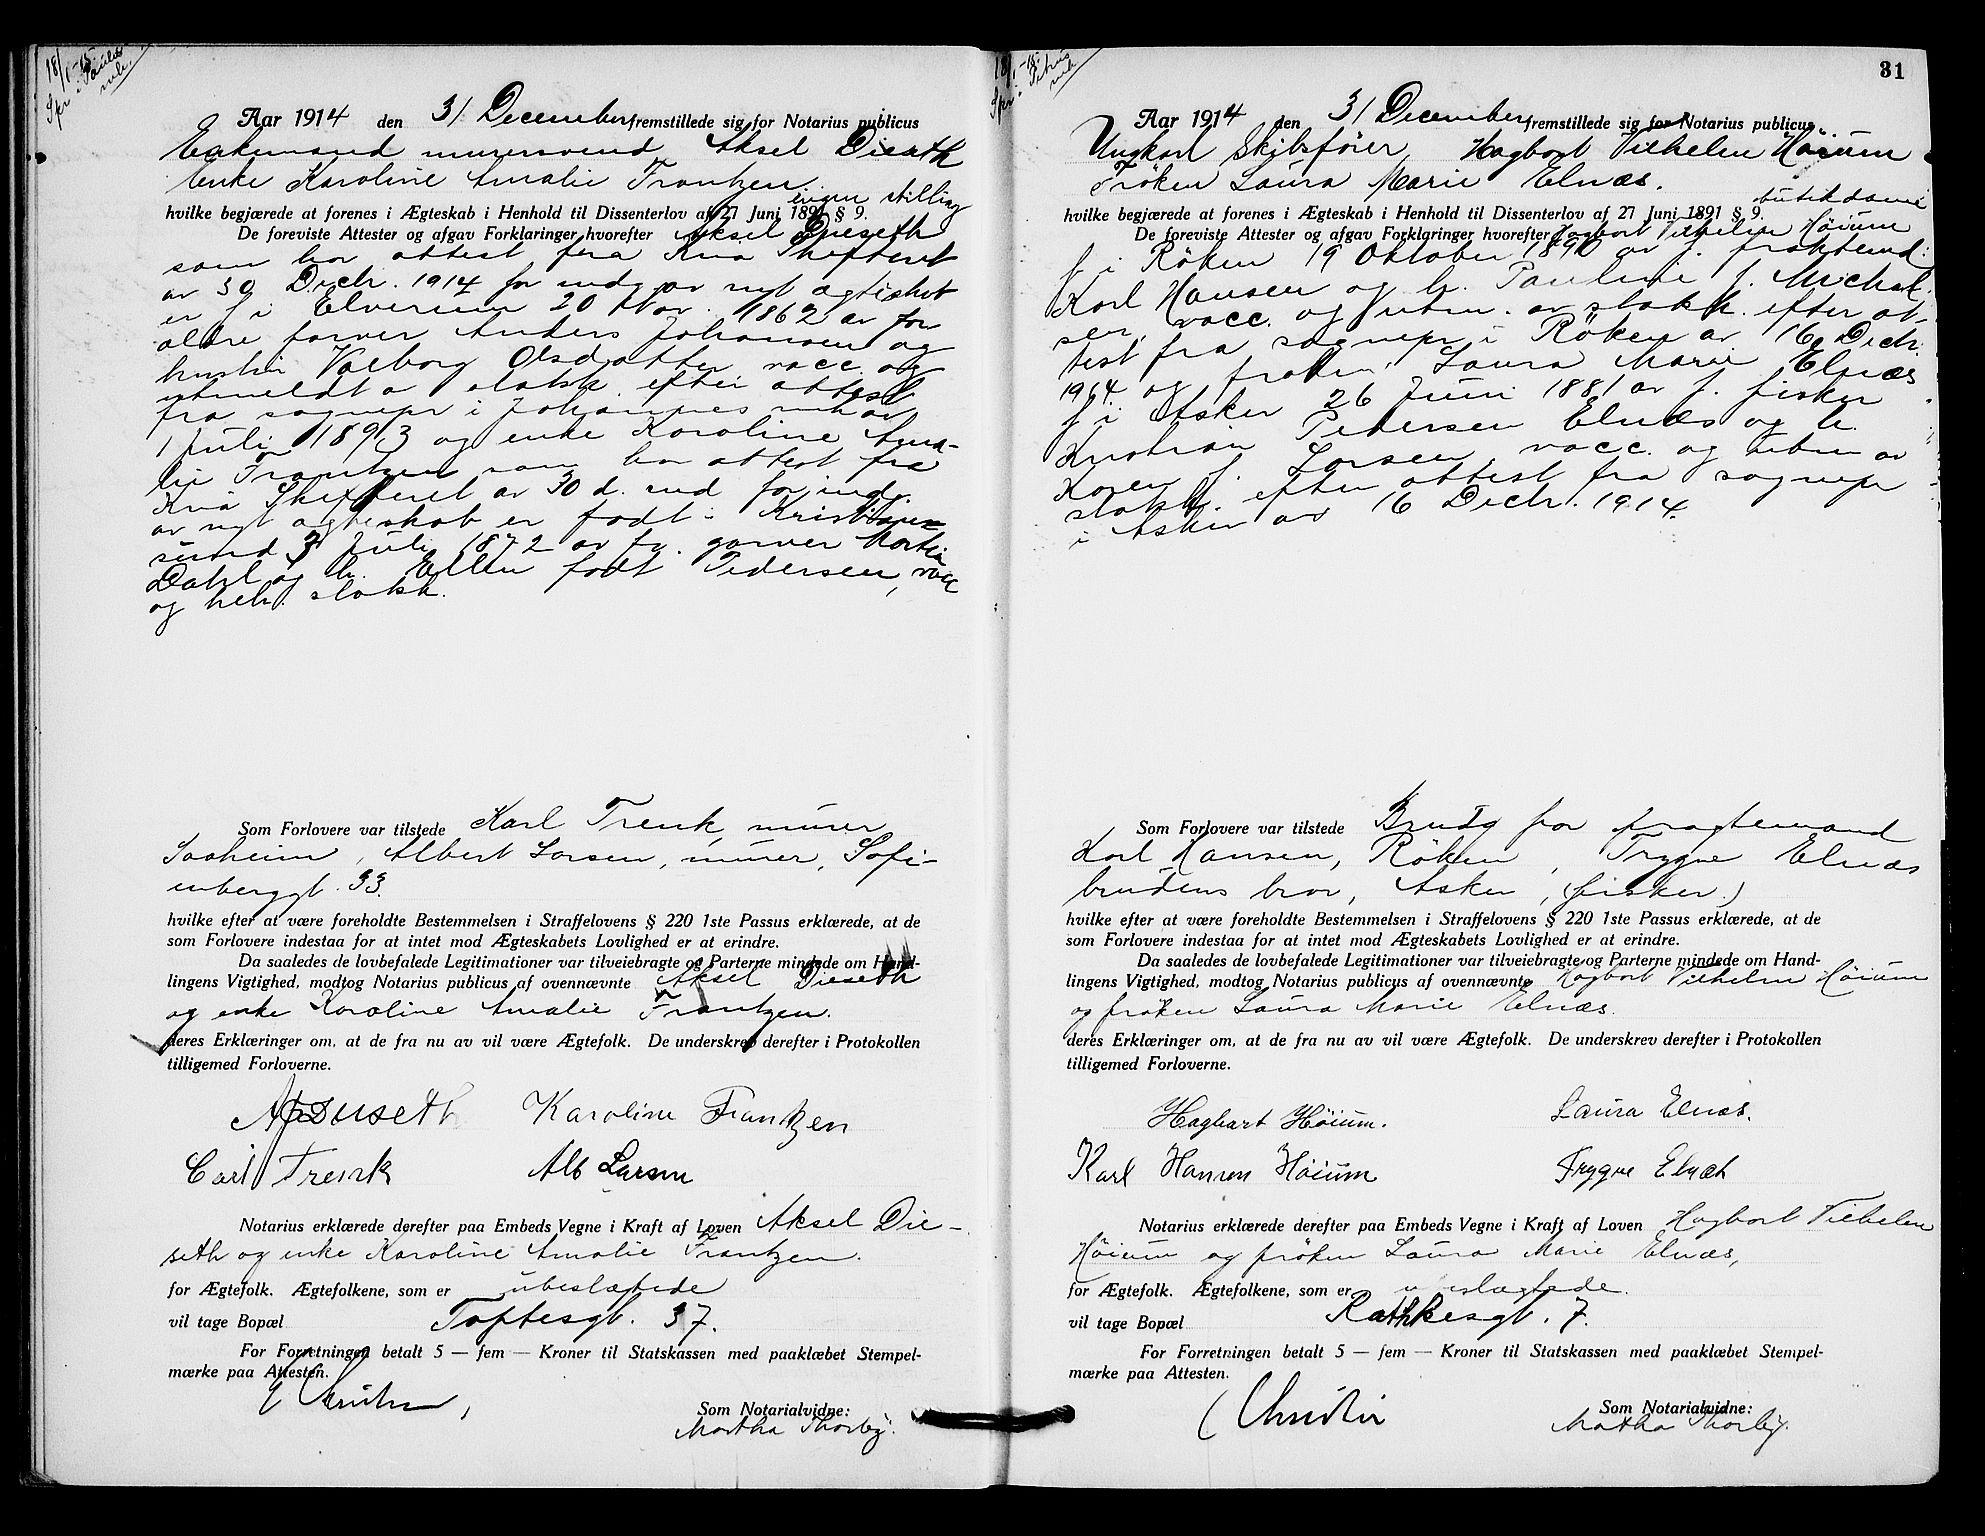 SAO, Oslo byfogd avd. I, L/Lb/Lbb/L0010: Notarialprotokoll, rekke II: Vigsler, 1914-1916, s. 30b-31a